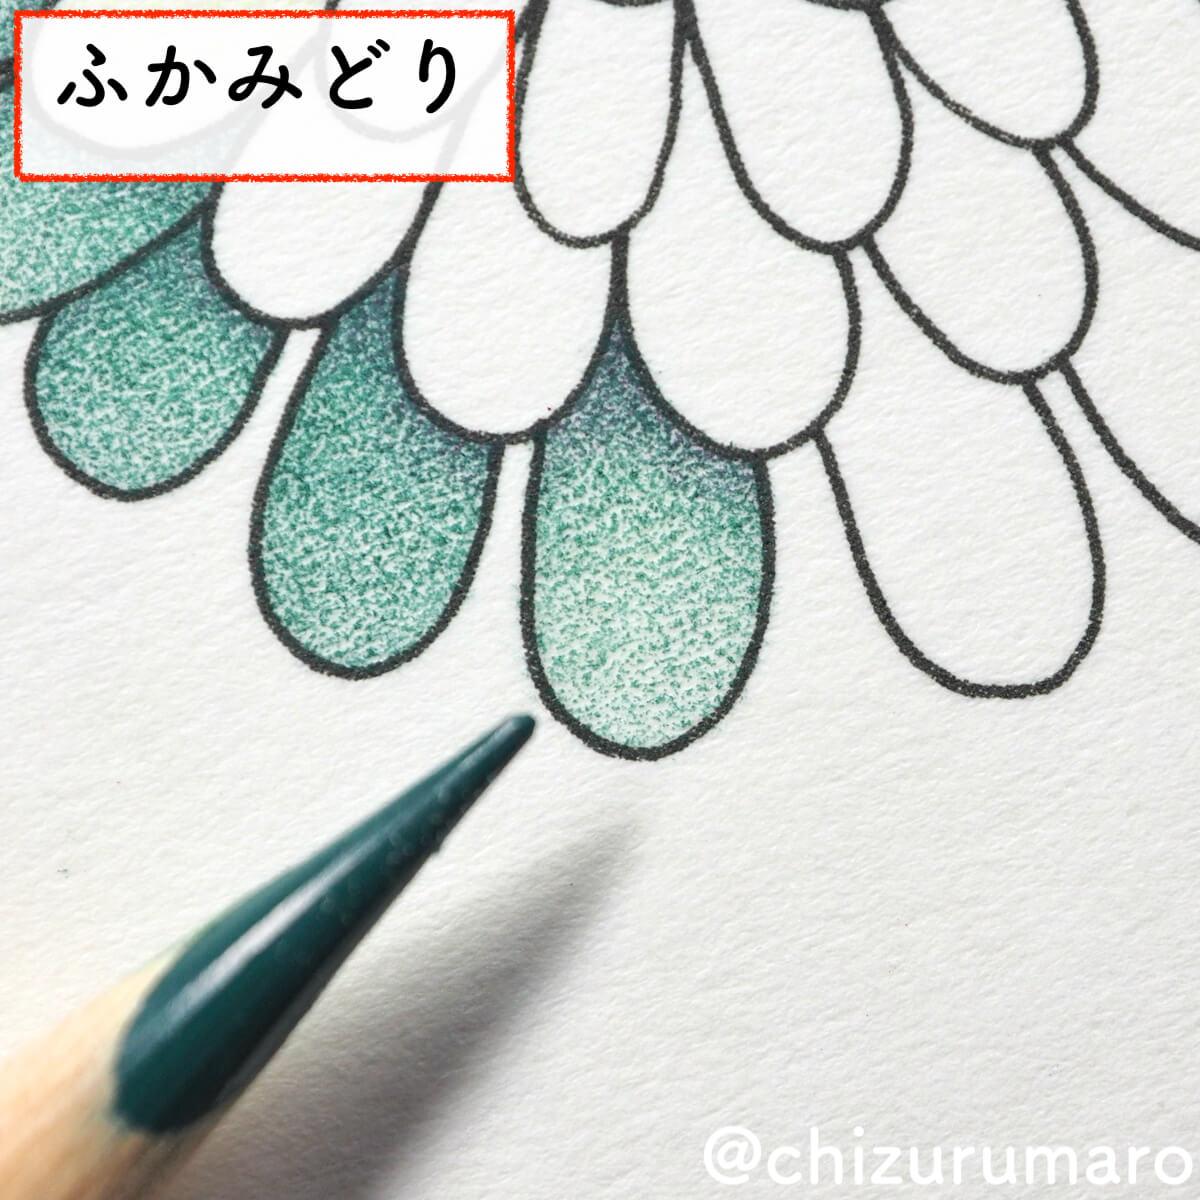 f:id:chizurumaro:20200430150513j:plain